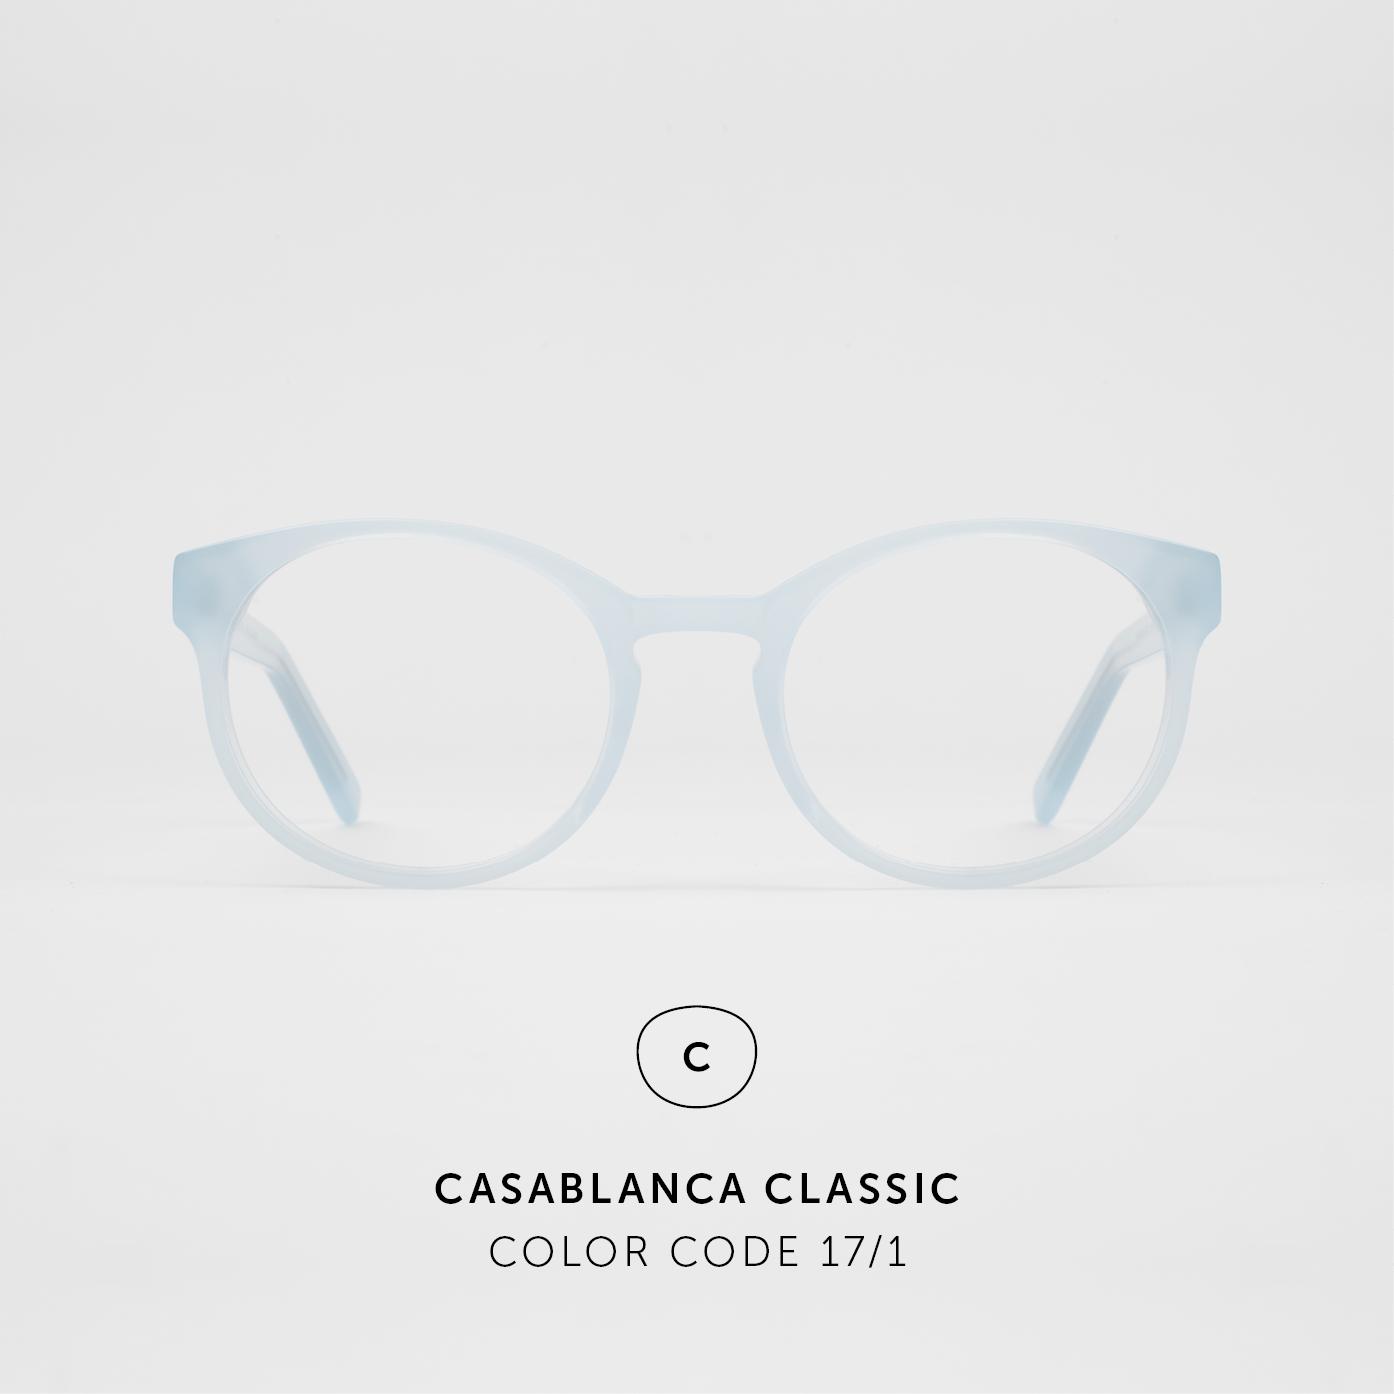 CasablancaClassic49.jpg